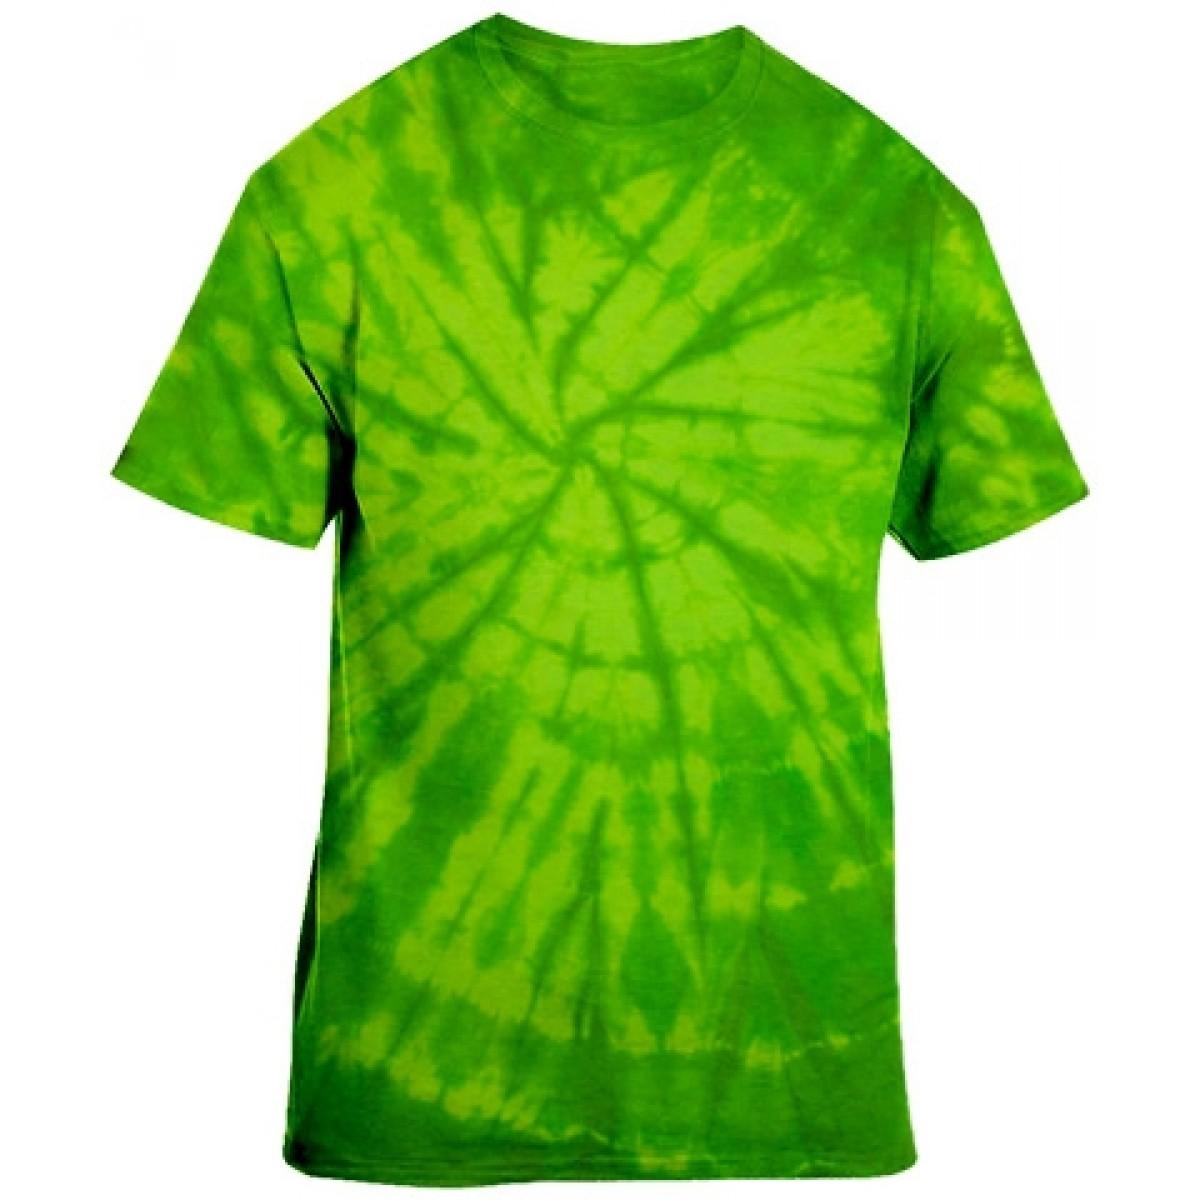 Tie-Dye Neon Green Short Sleeve-Neon Green-S